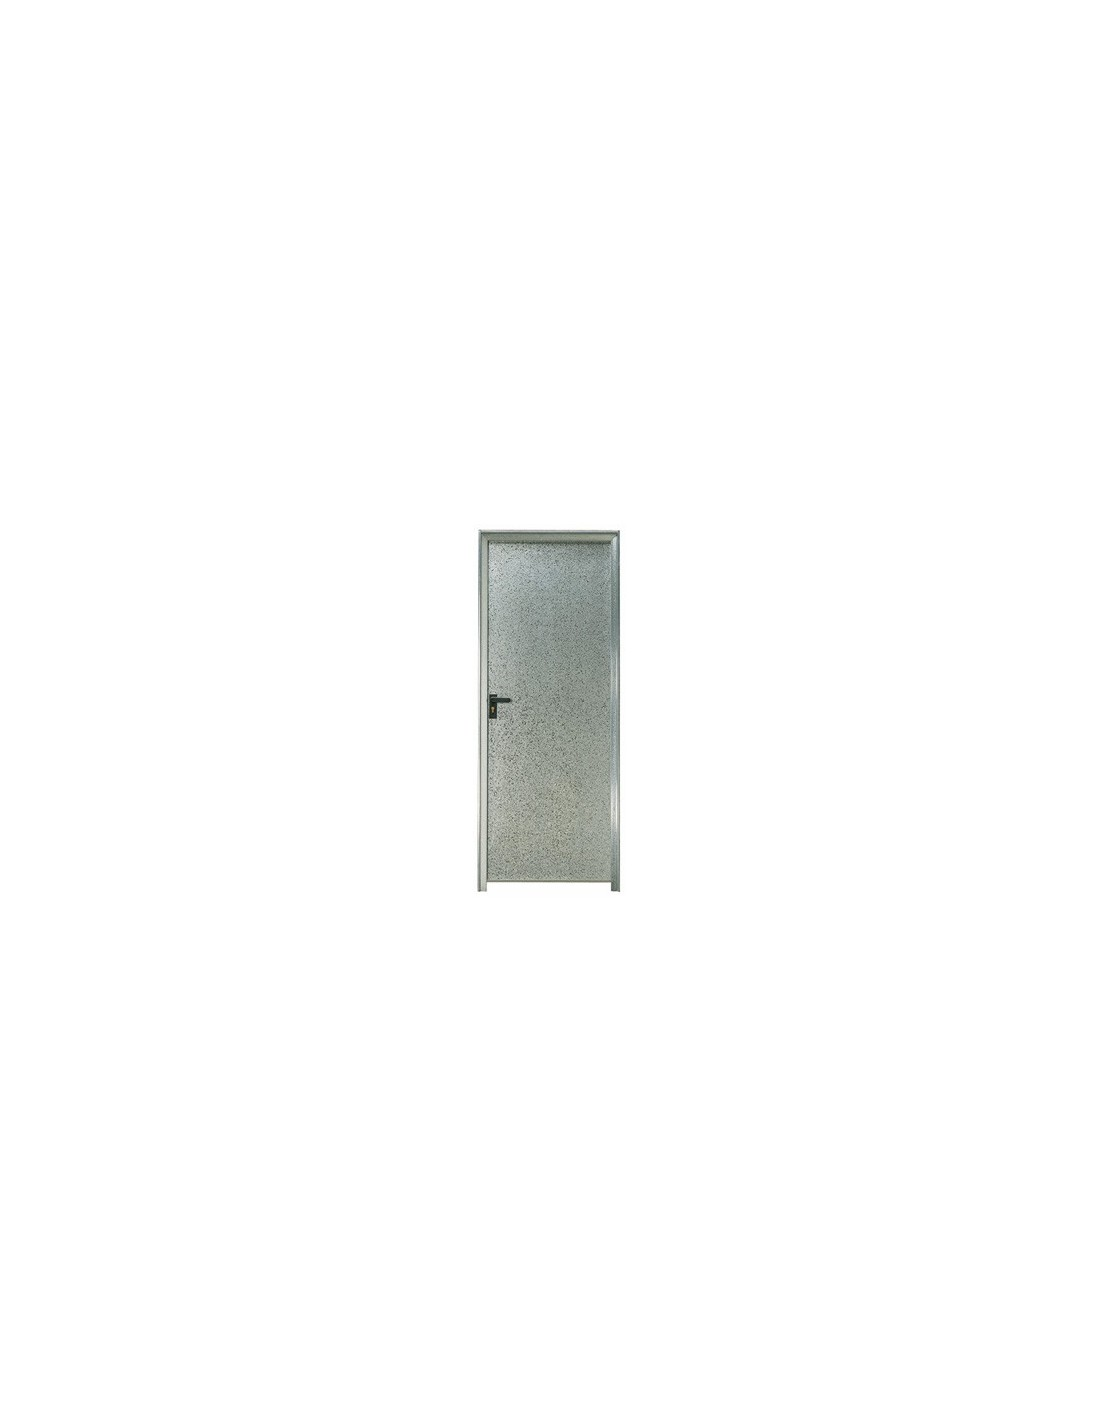 Puerta chapa galvanizada 80 x 2 m marco de 90 mm ciega derecha bricomel - Puertas de chapa galvanizada ...